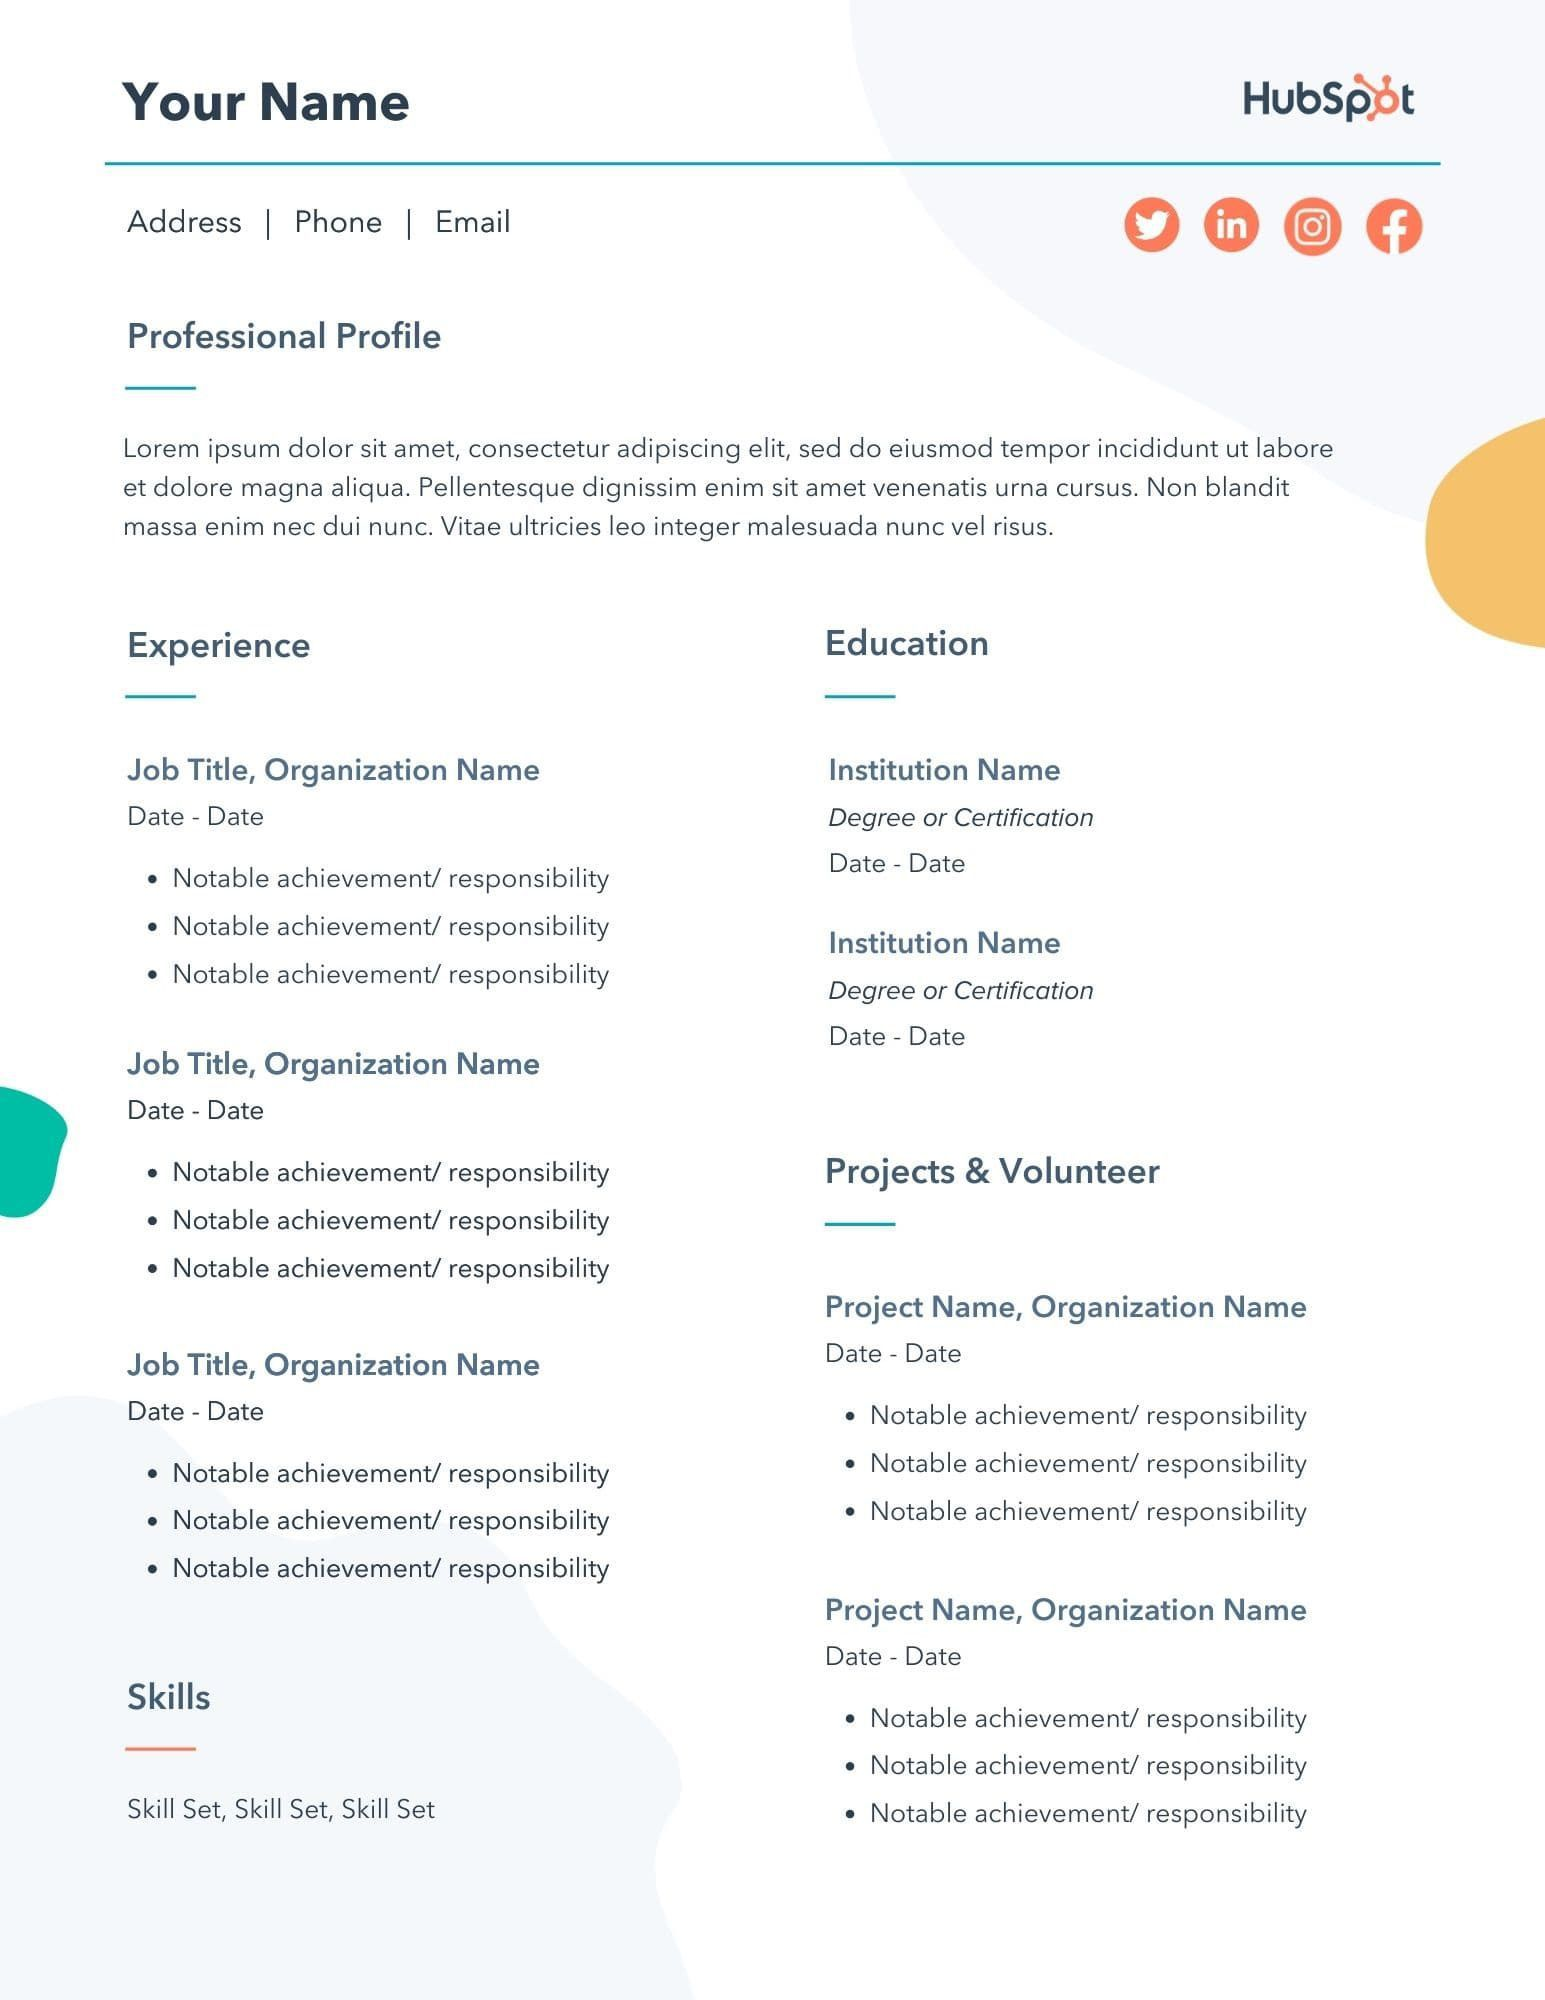 009 Shocking Download Resume Sample Free High Definition  Teacher Cv Graphic Designer Word Format Nurse TemplateFull